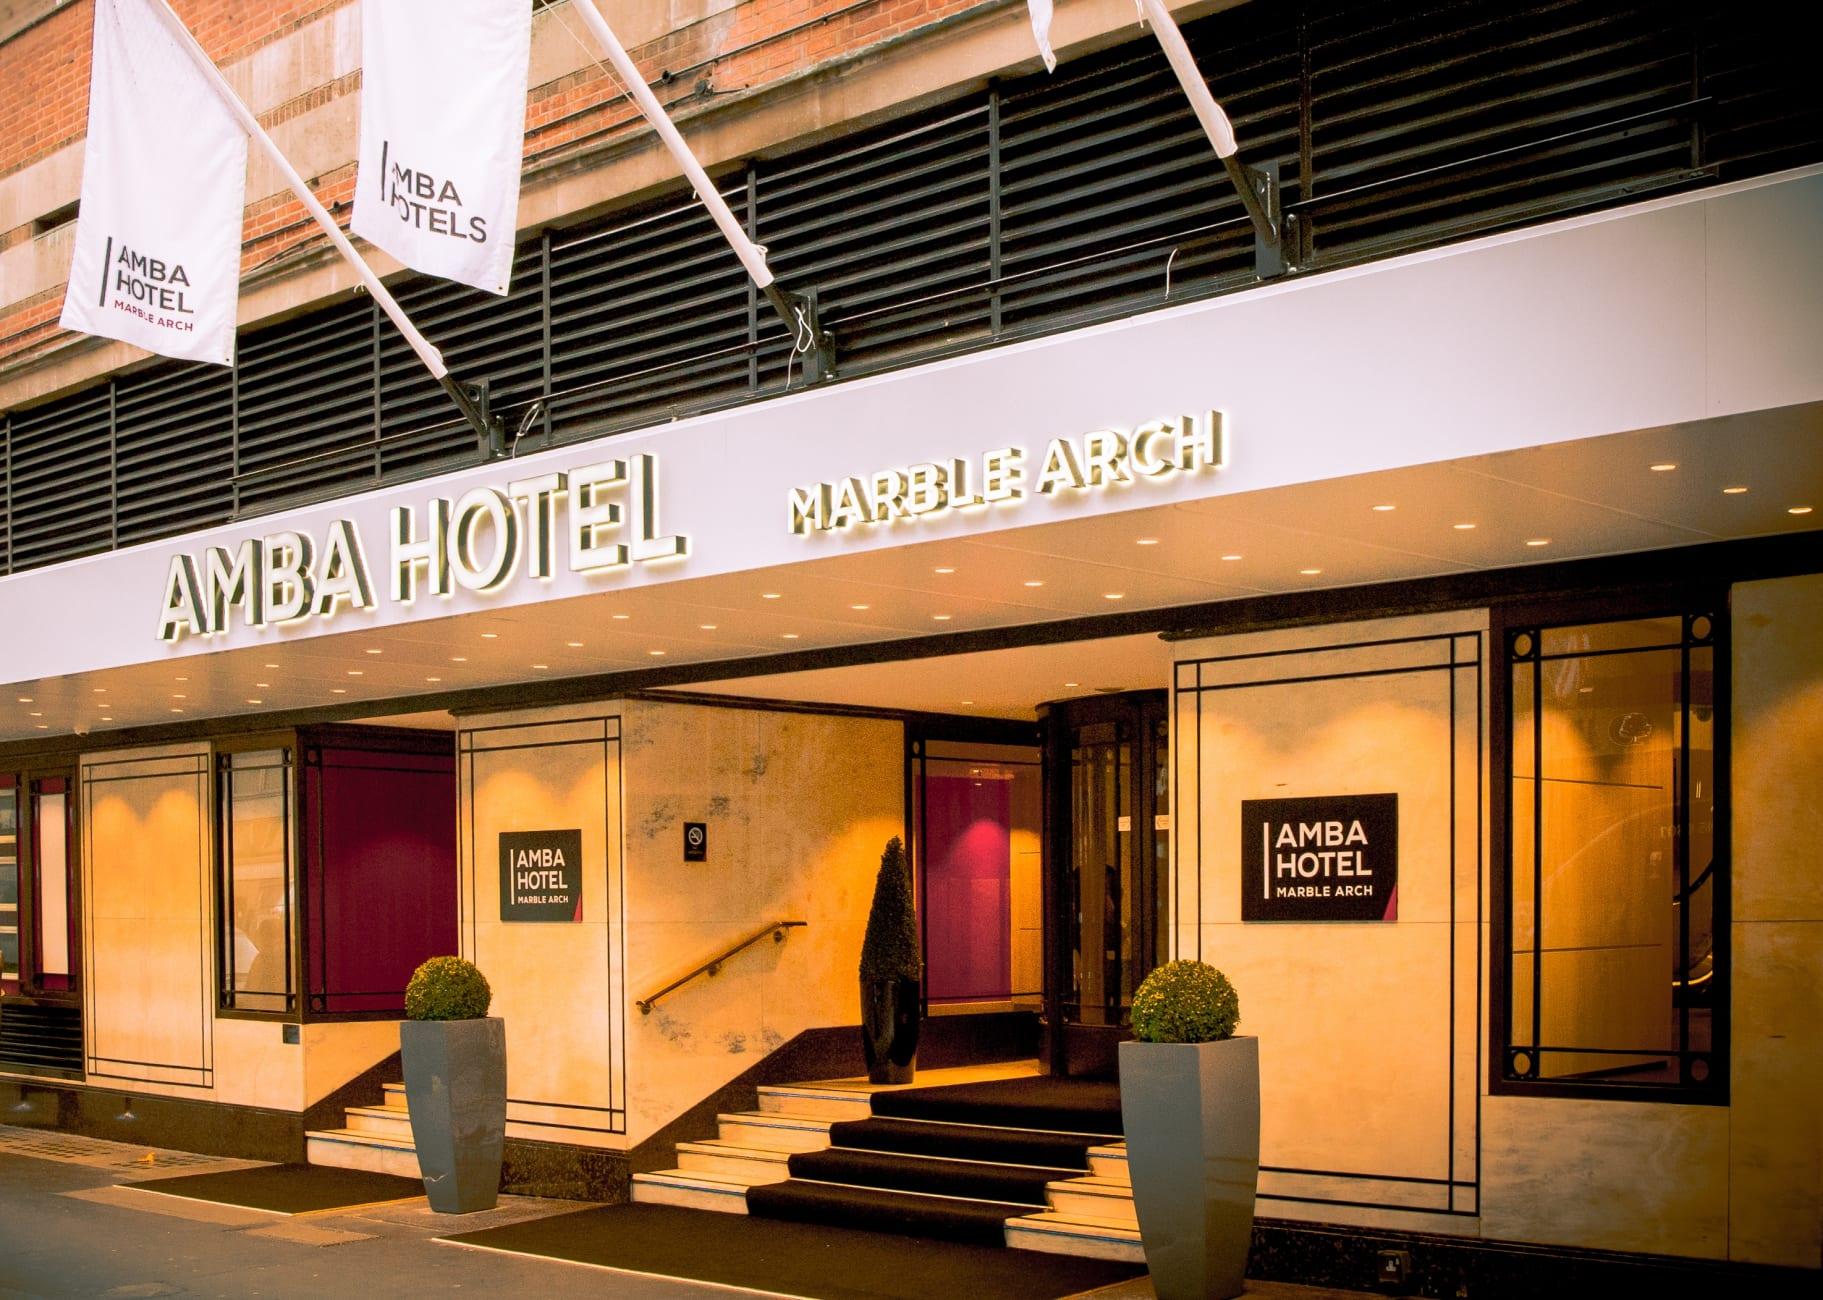 Hotel Amba Hotel Marble Arch London Trivago Co Id